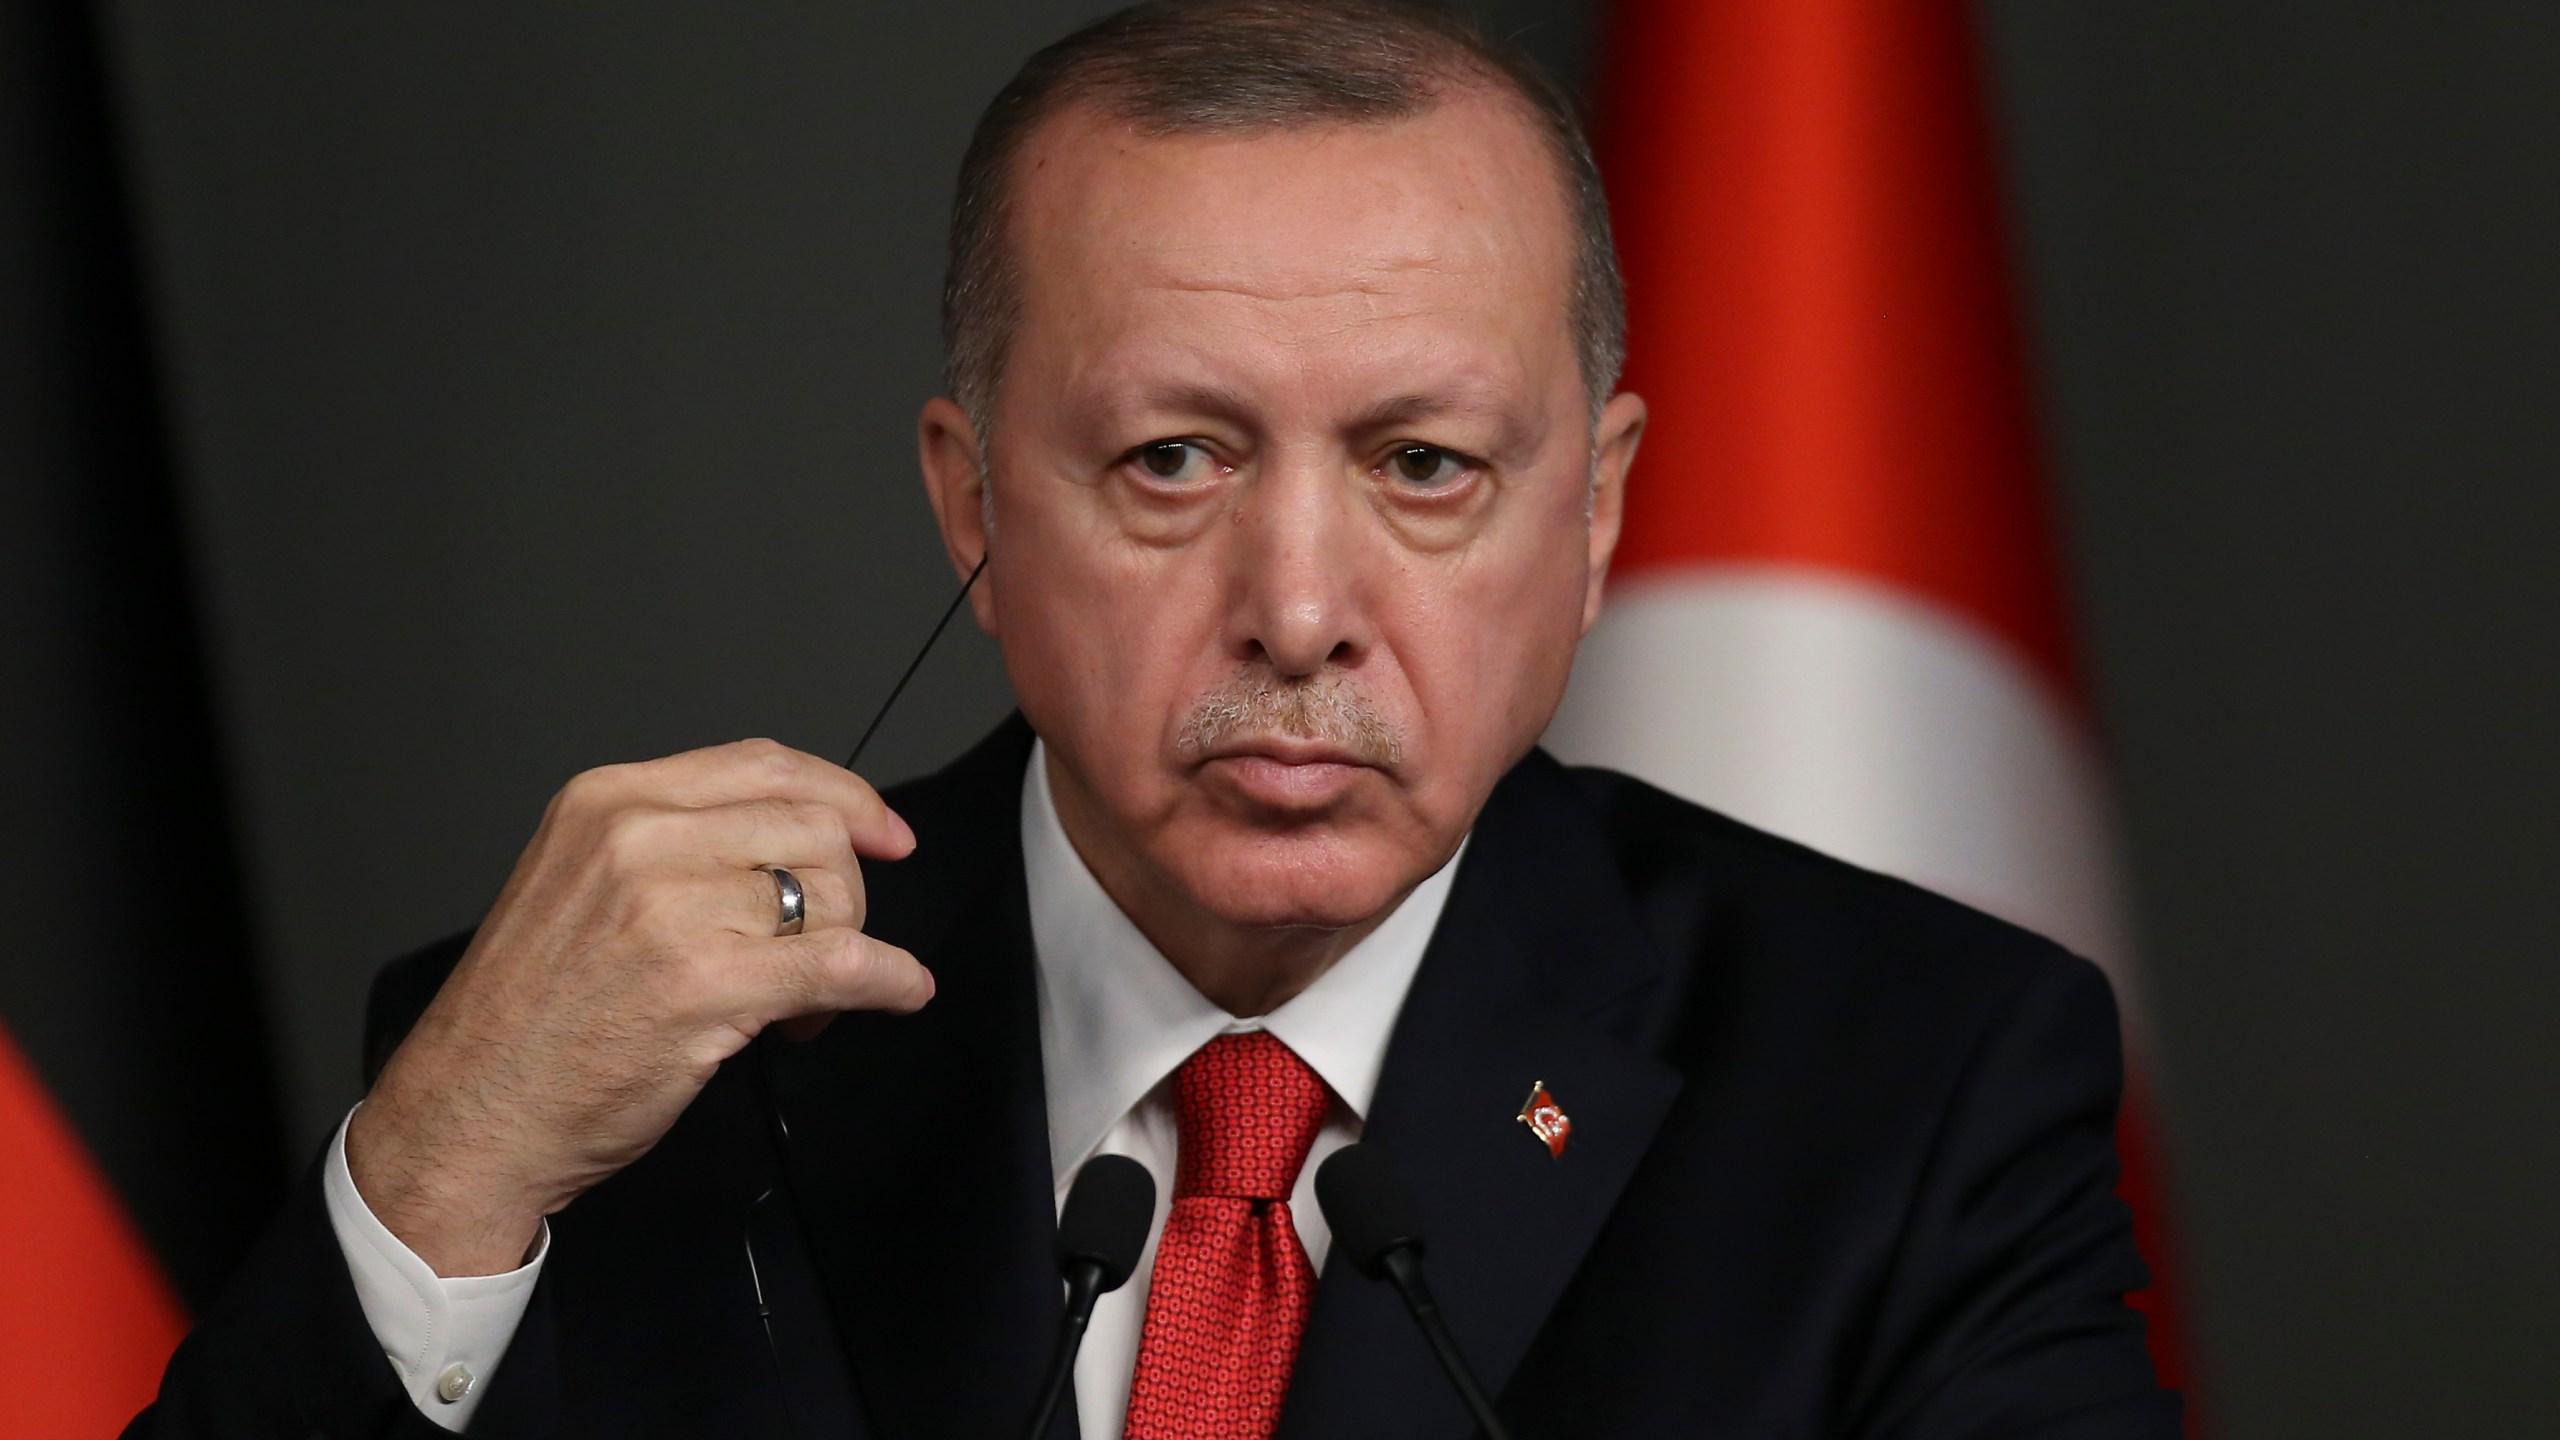 Angela Merkel, Chancellor of Germany visits Turkey